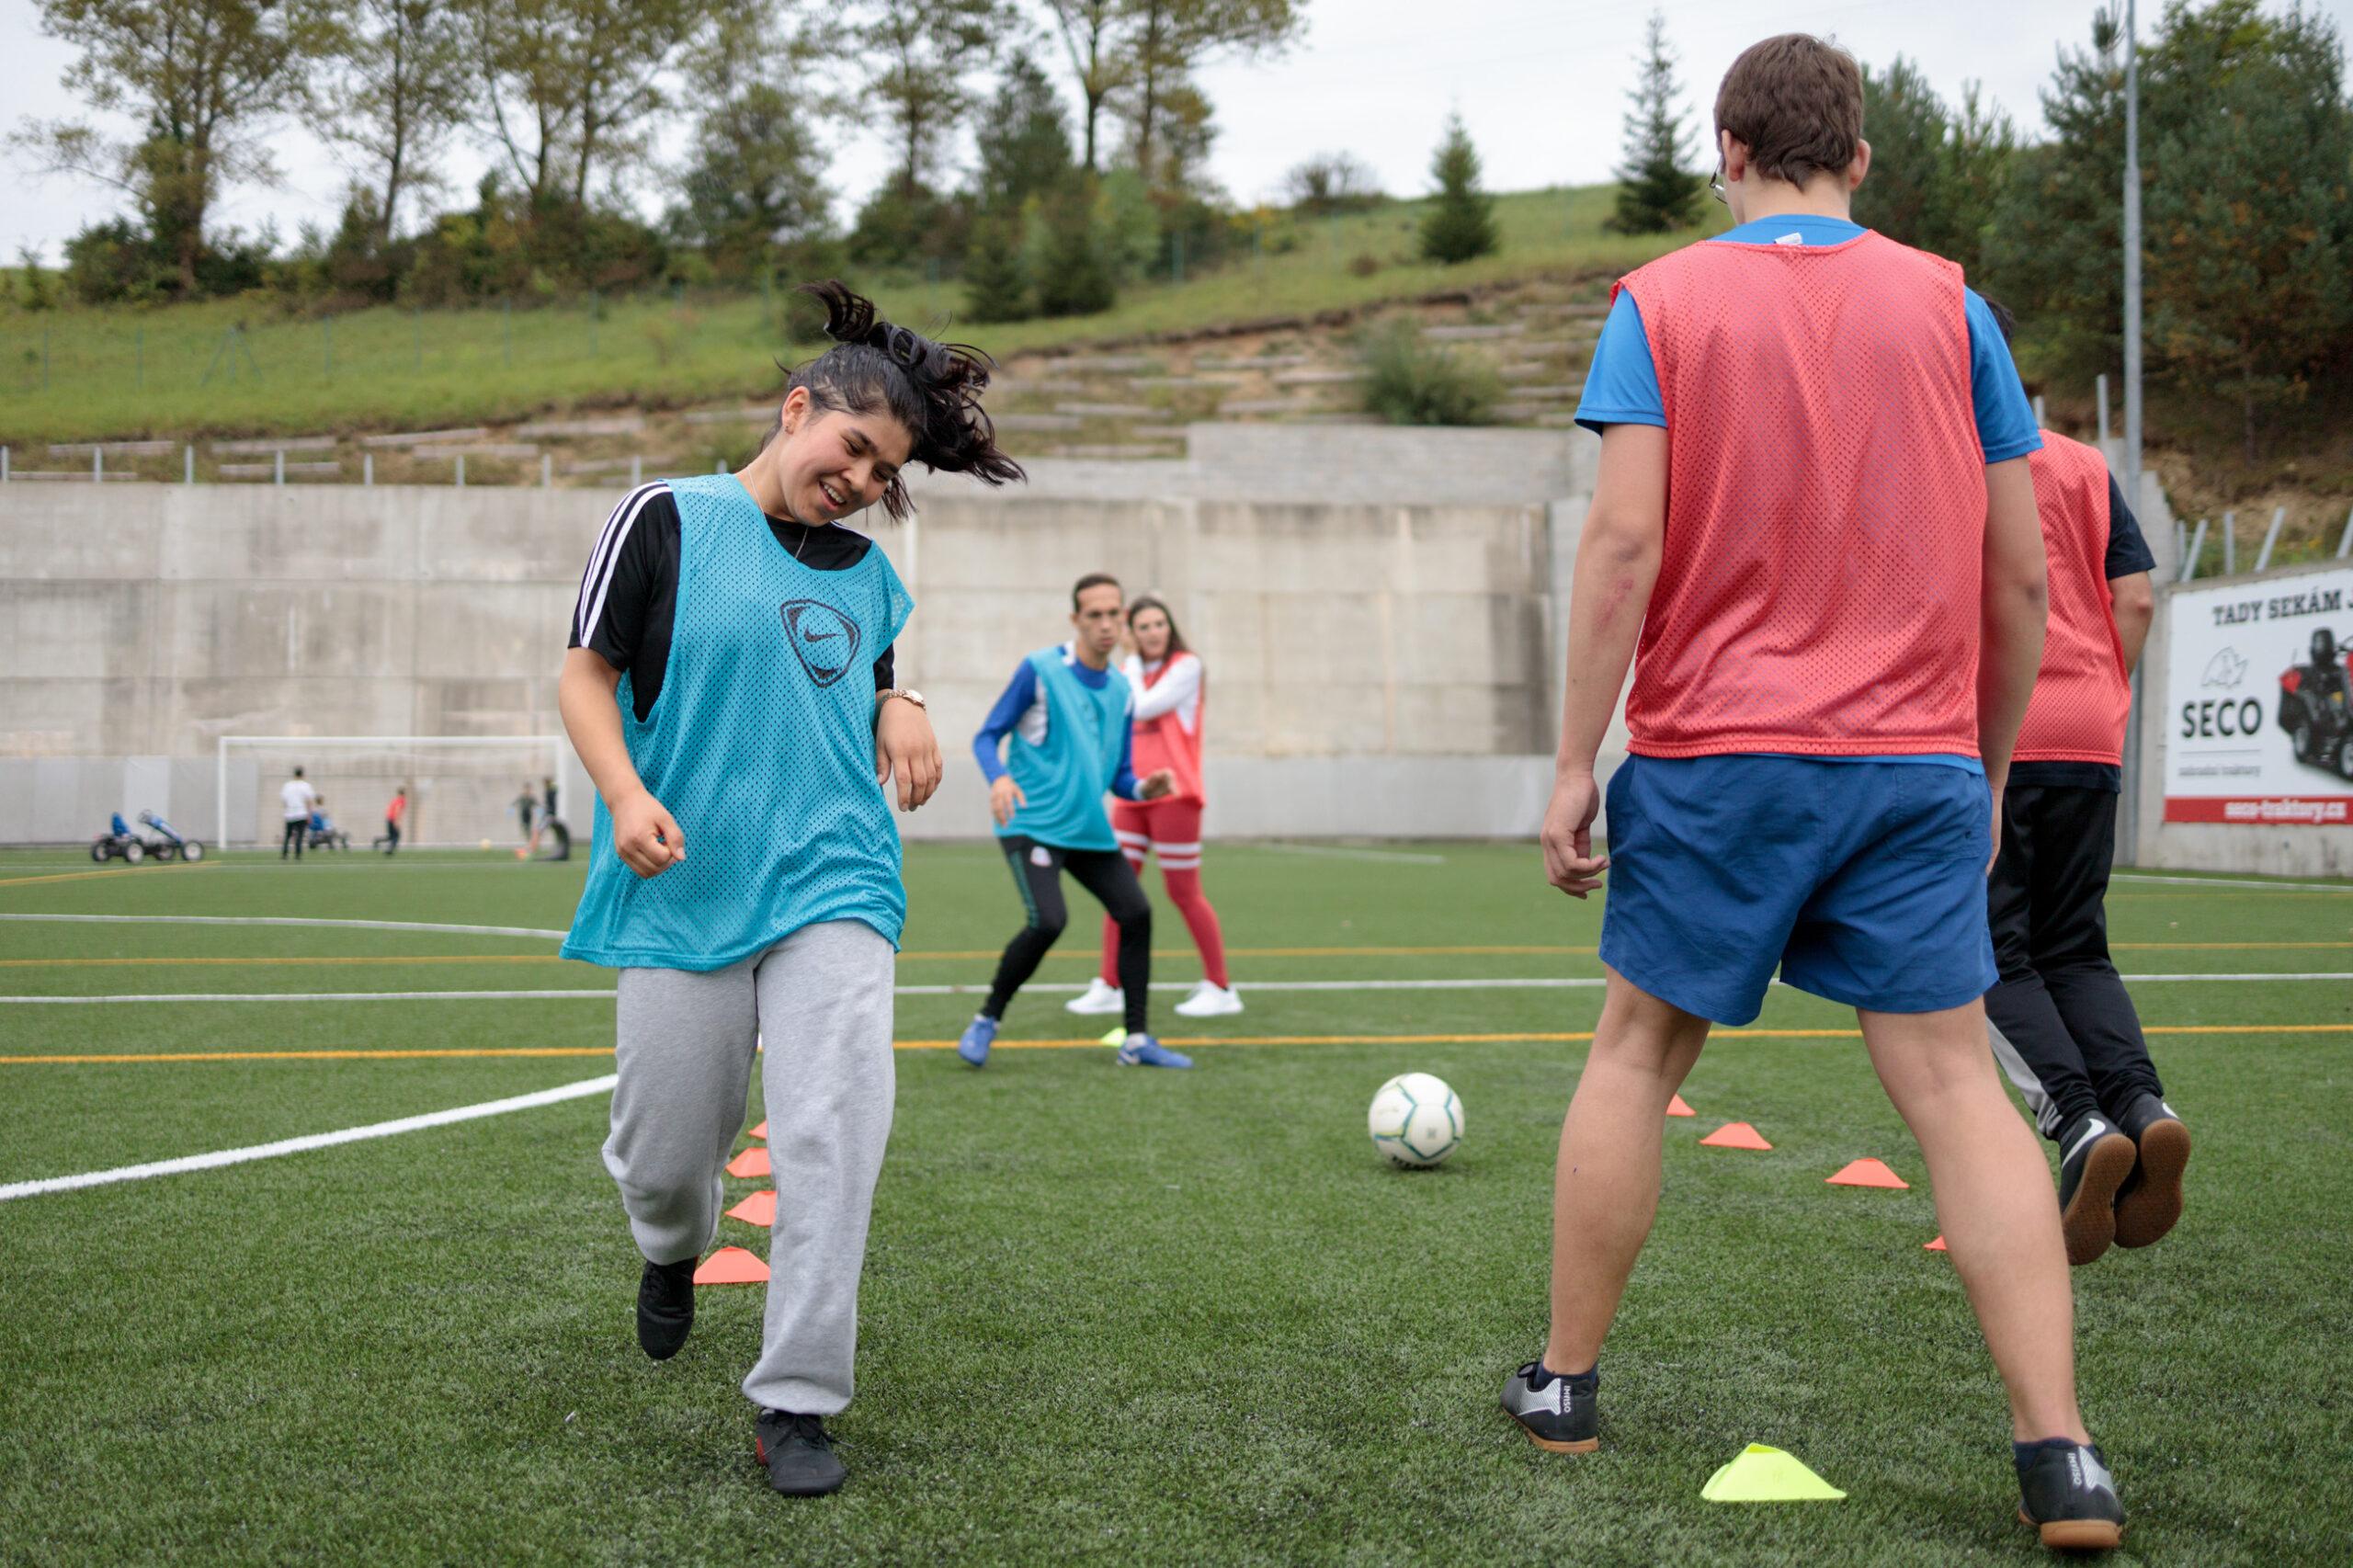 Youth leadership training, Český Dub, Czech Republic